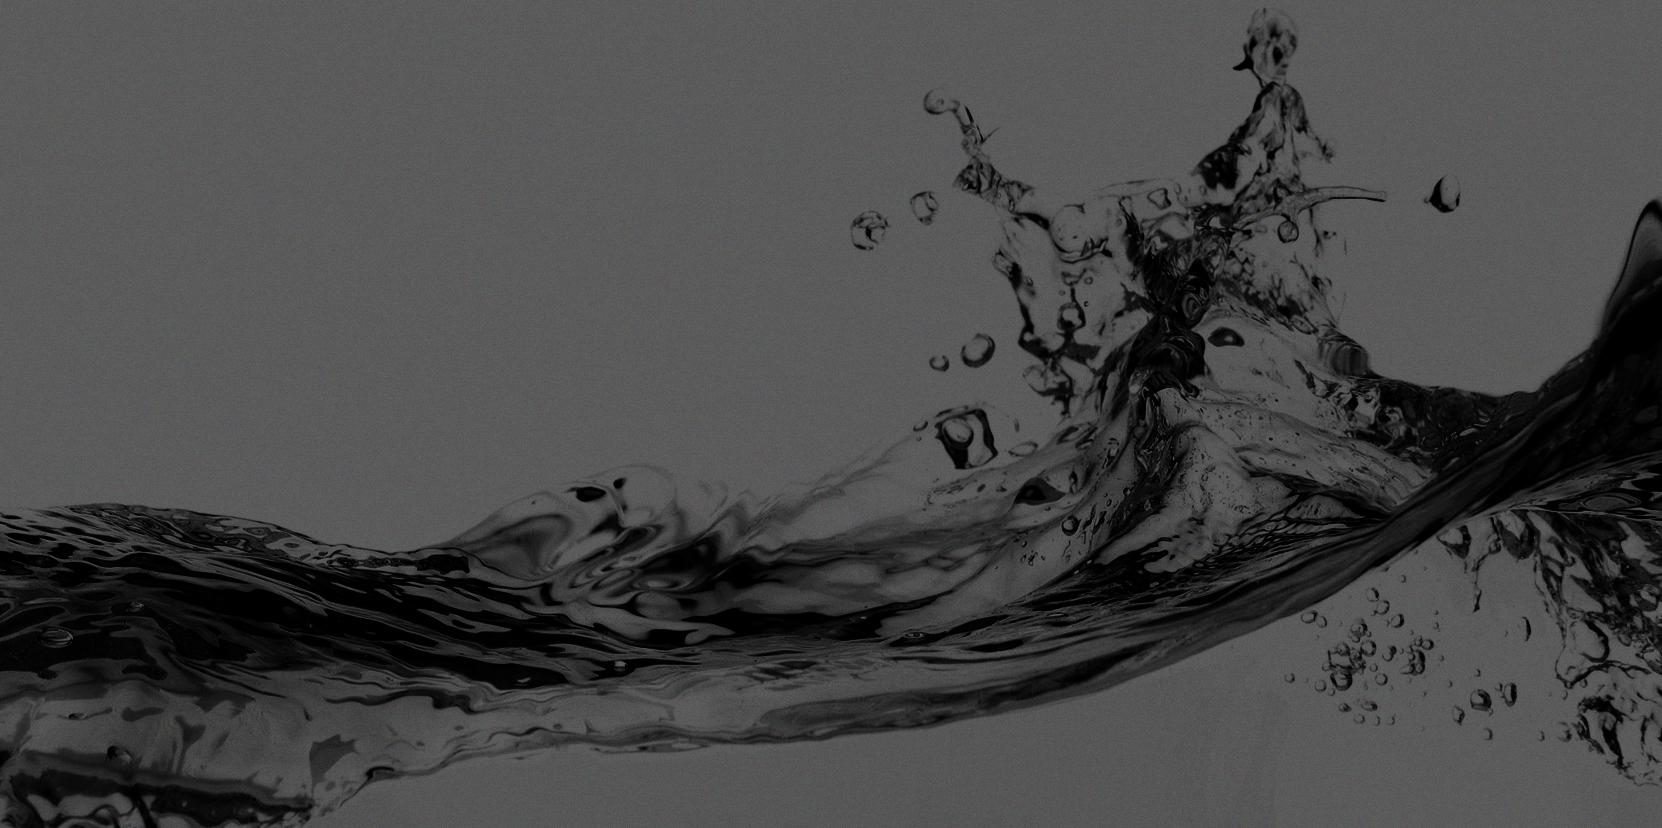 02-Motivatr-benefits-of-water.jpg